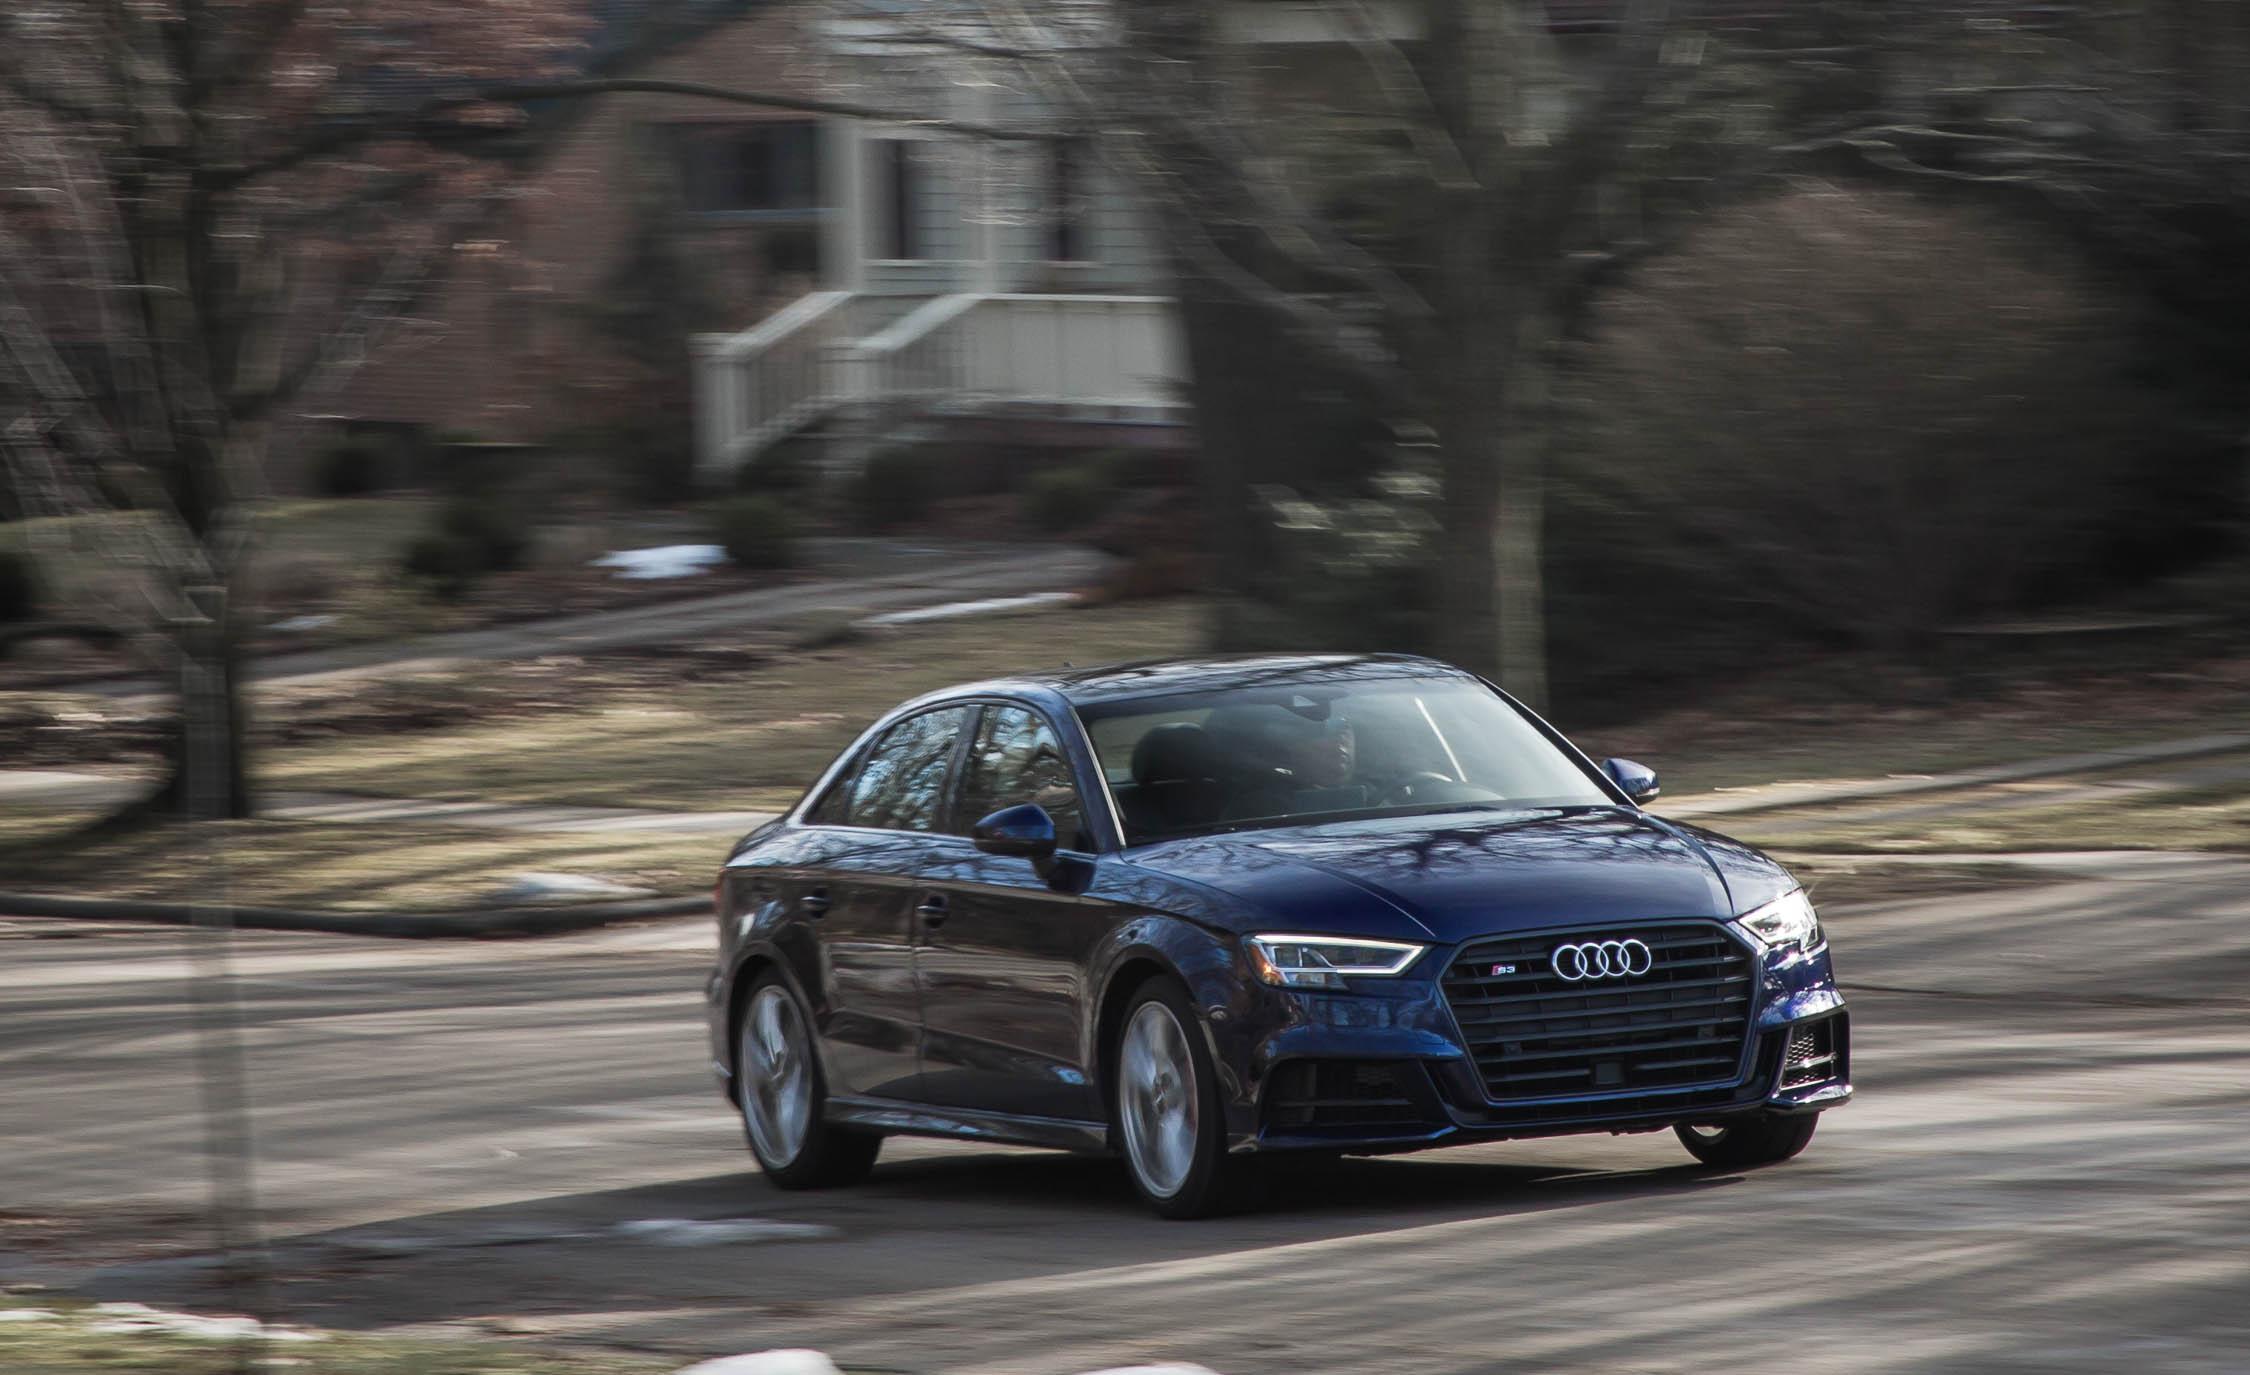 2017 Audi S3 Black Metallic (Photo 2 of 50)